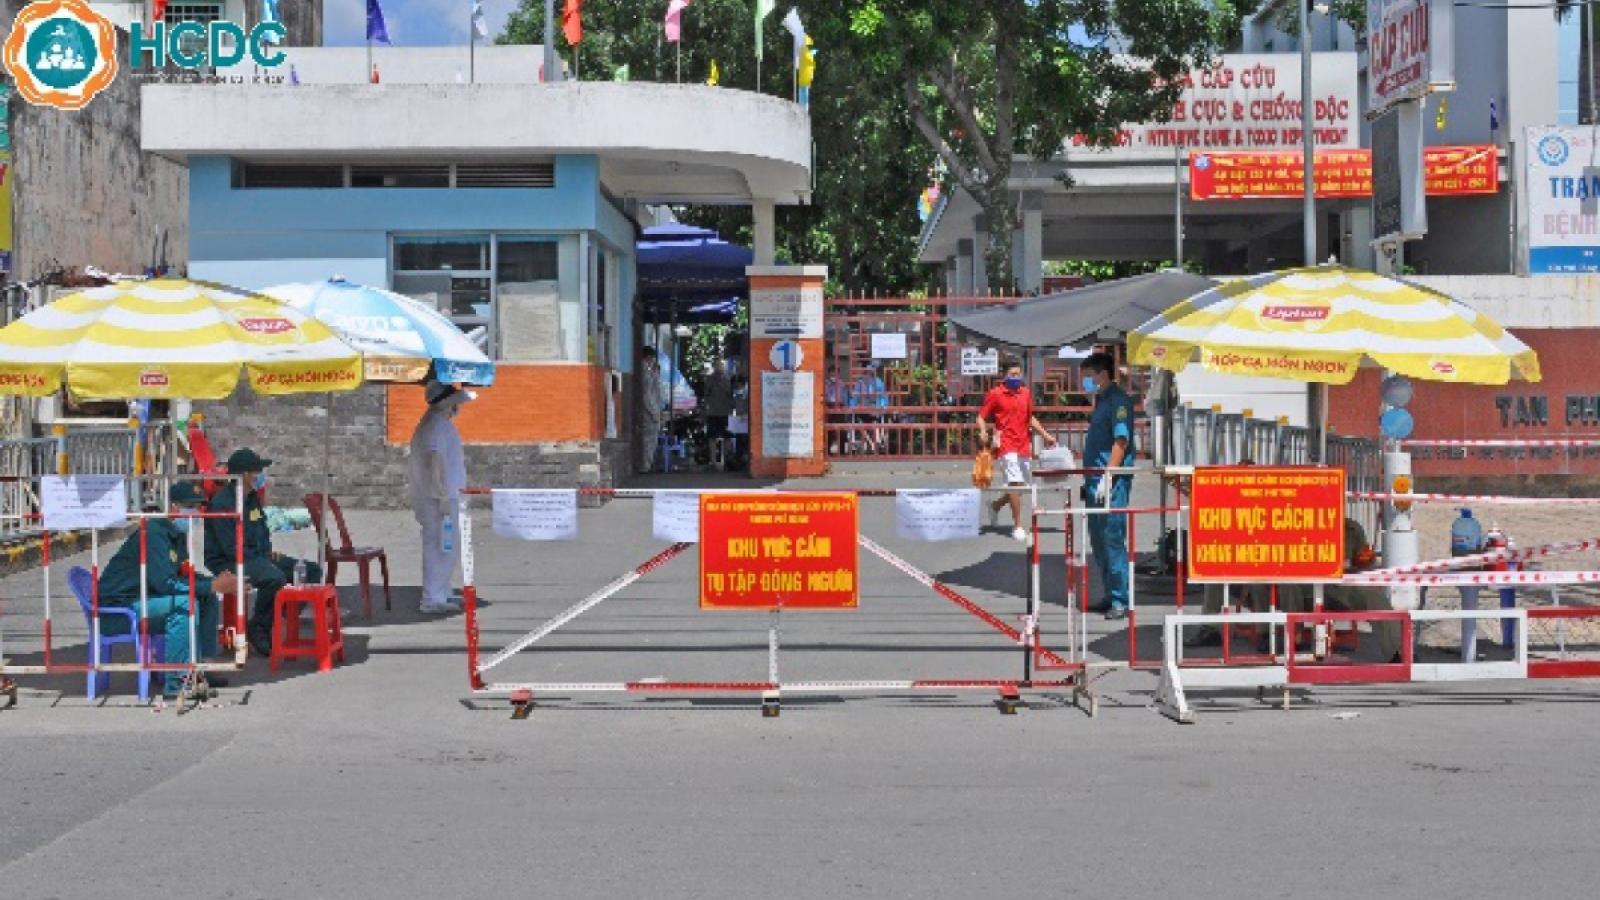 Ho Chi Minh City on full alert as dozens test positive for COVID-19